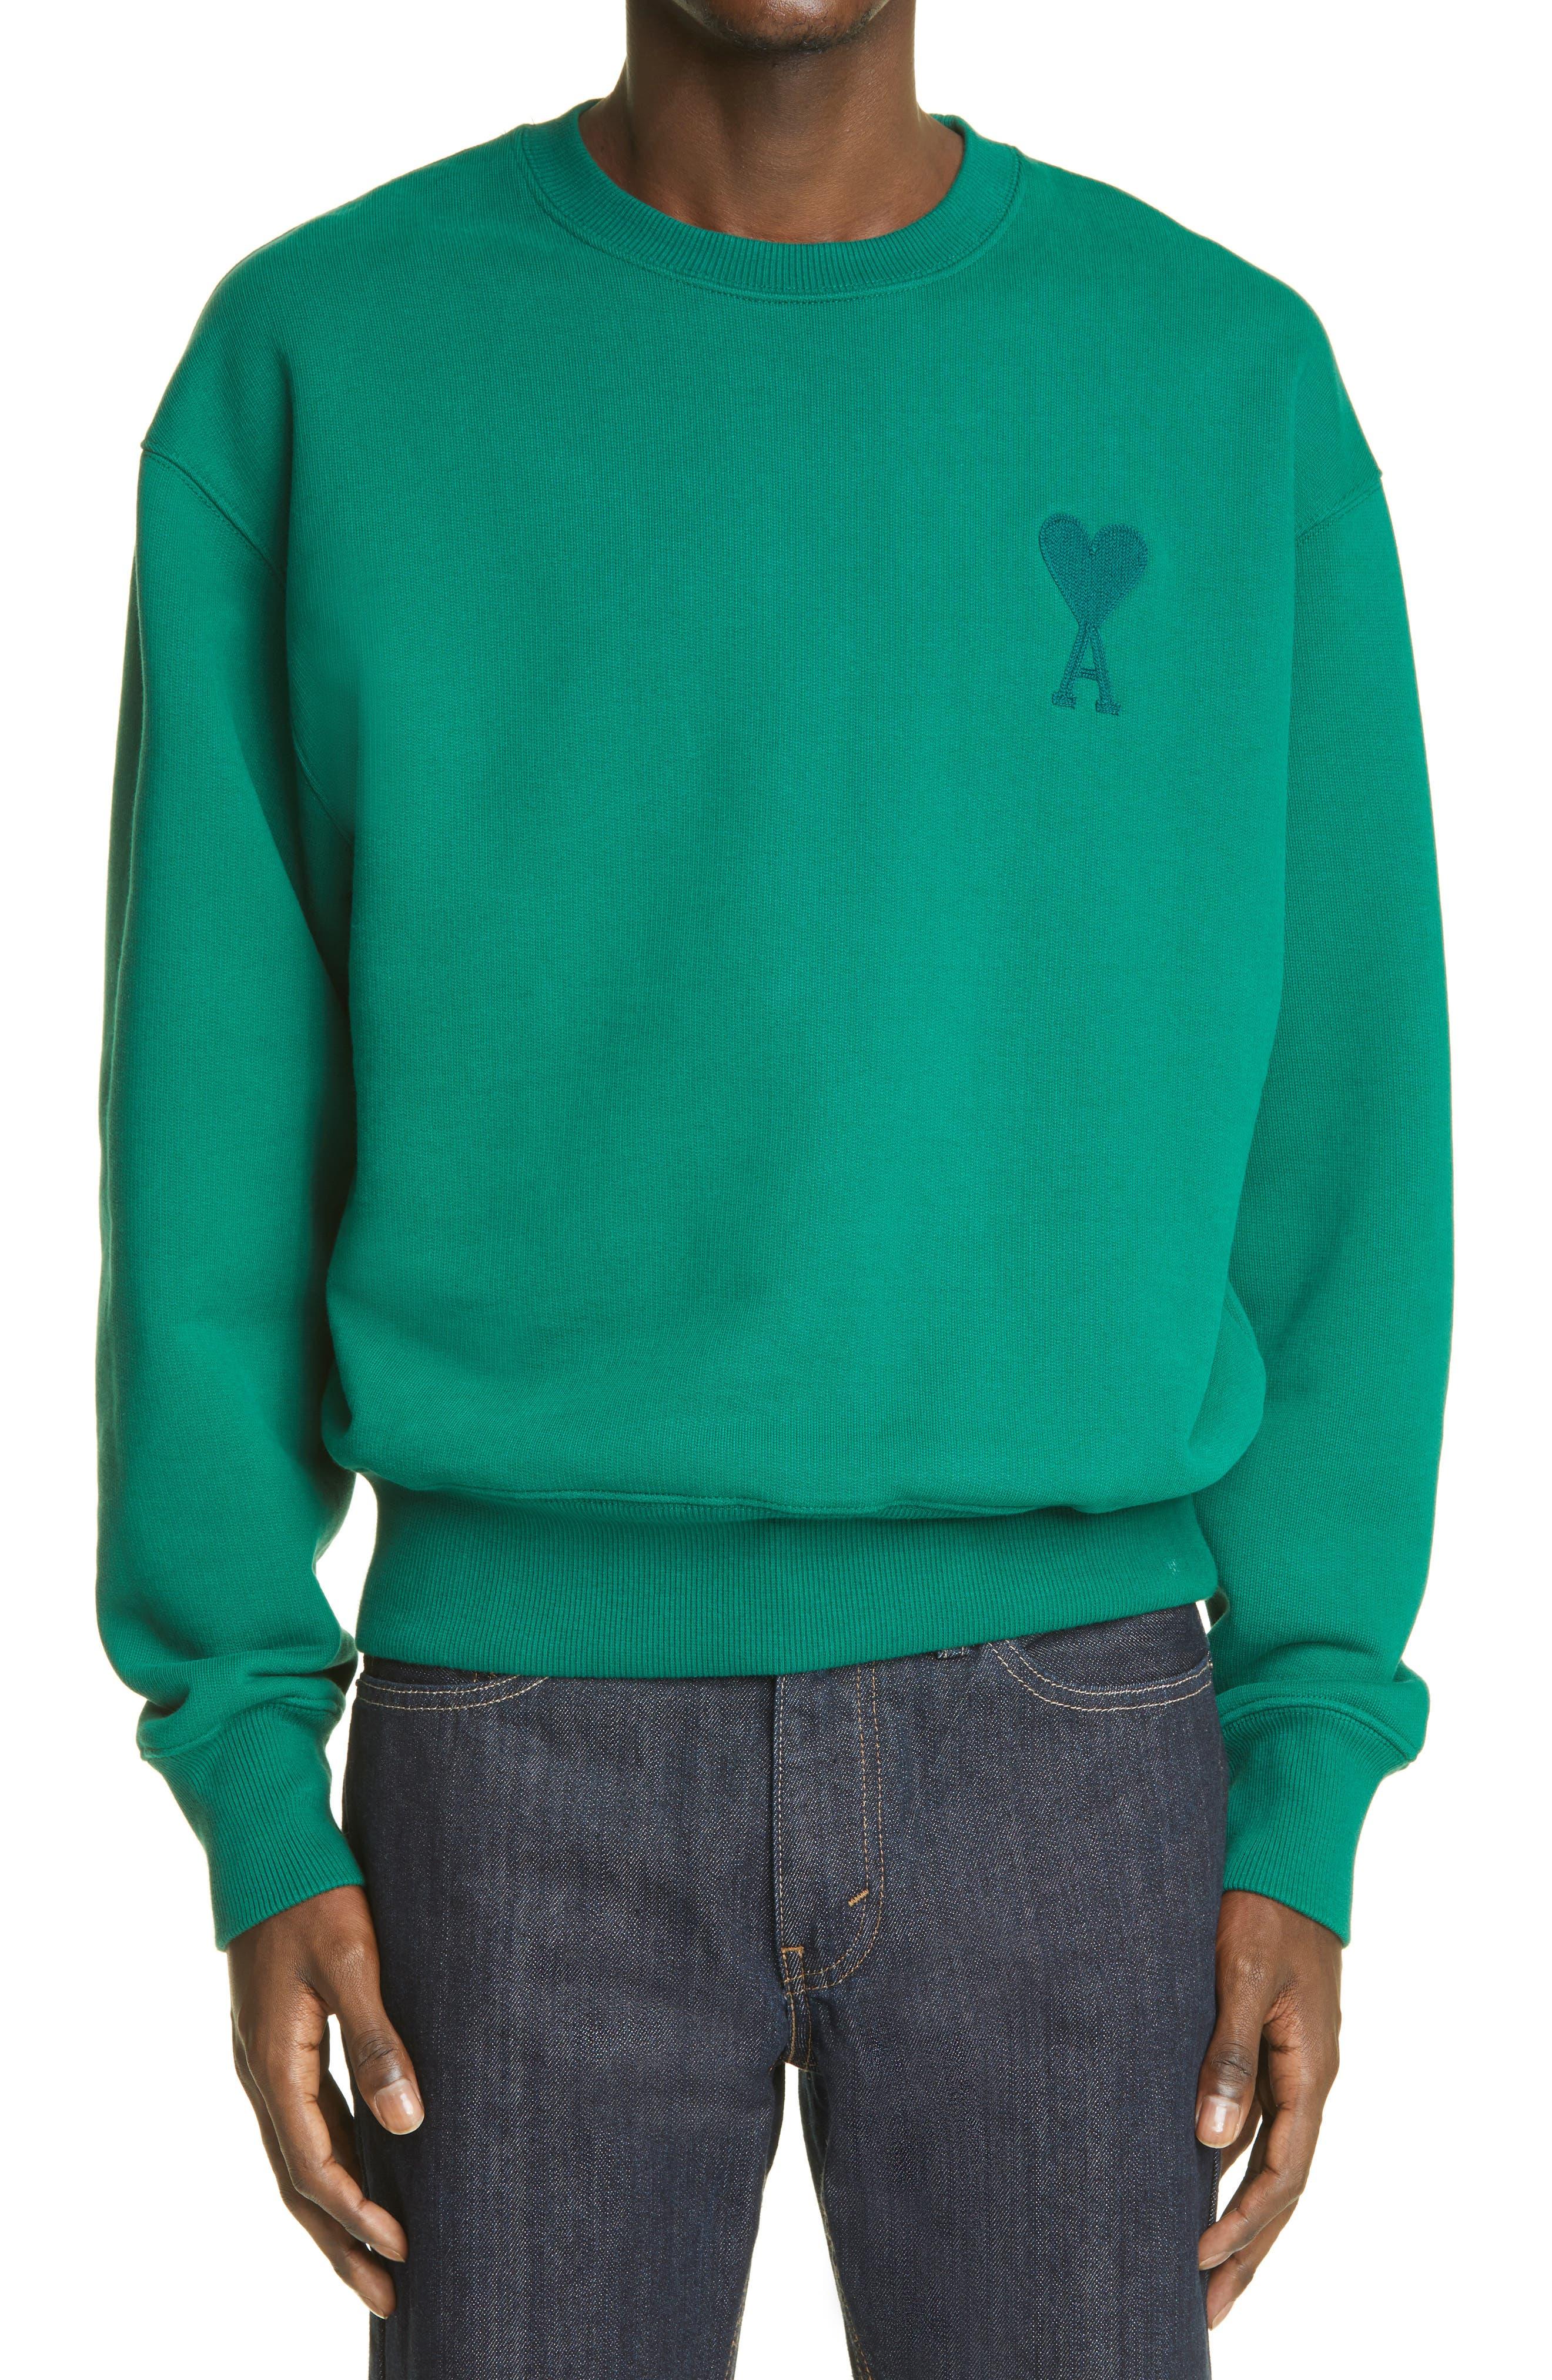 Ami De Coeur Embroidered Organic Cotton Sweatshirt